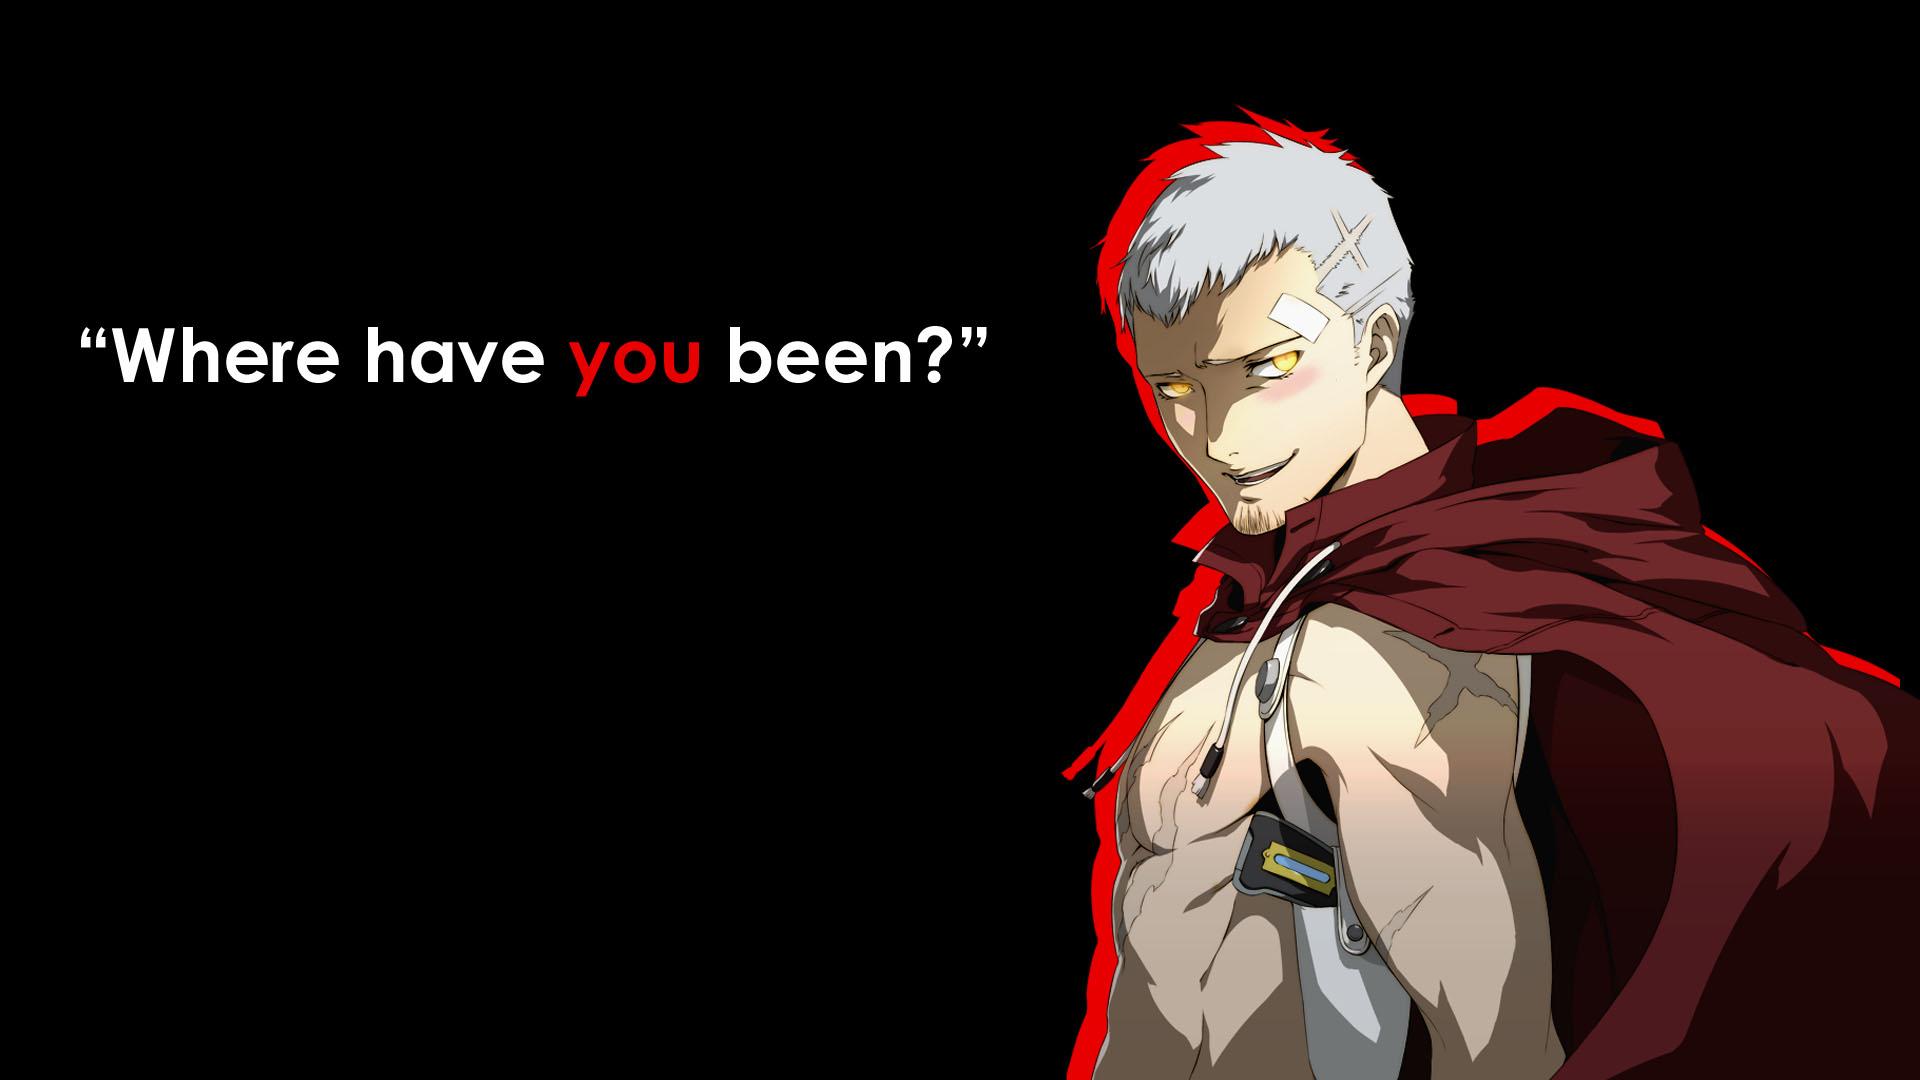 Persona 4 Wallpaper HD 1080p